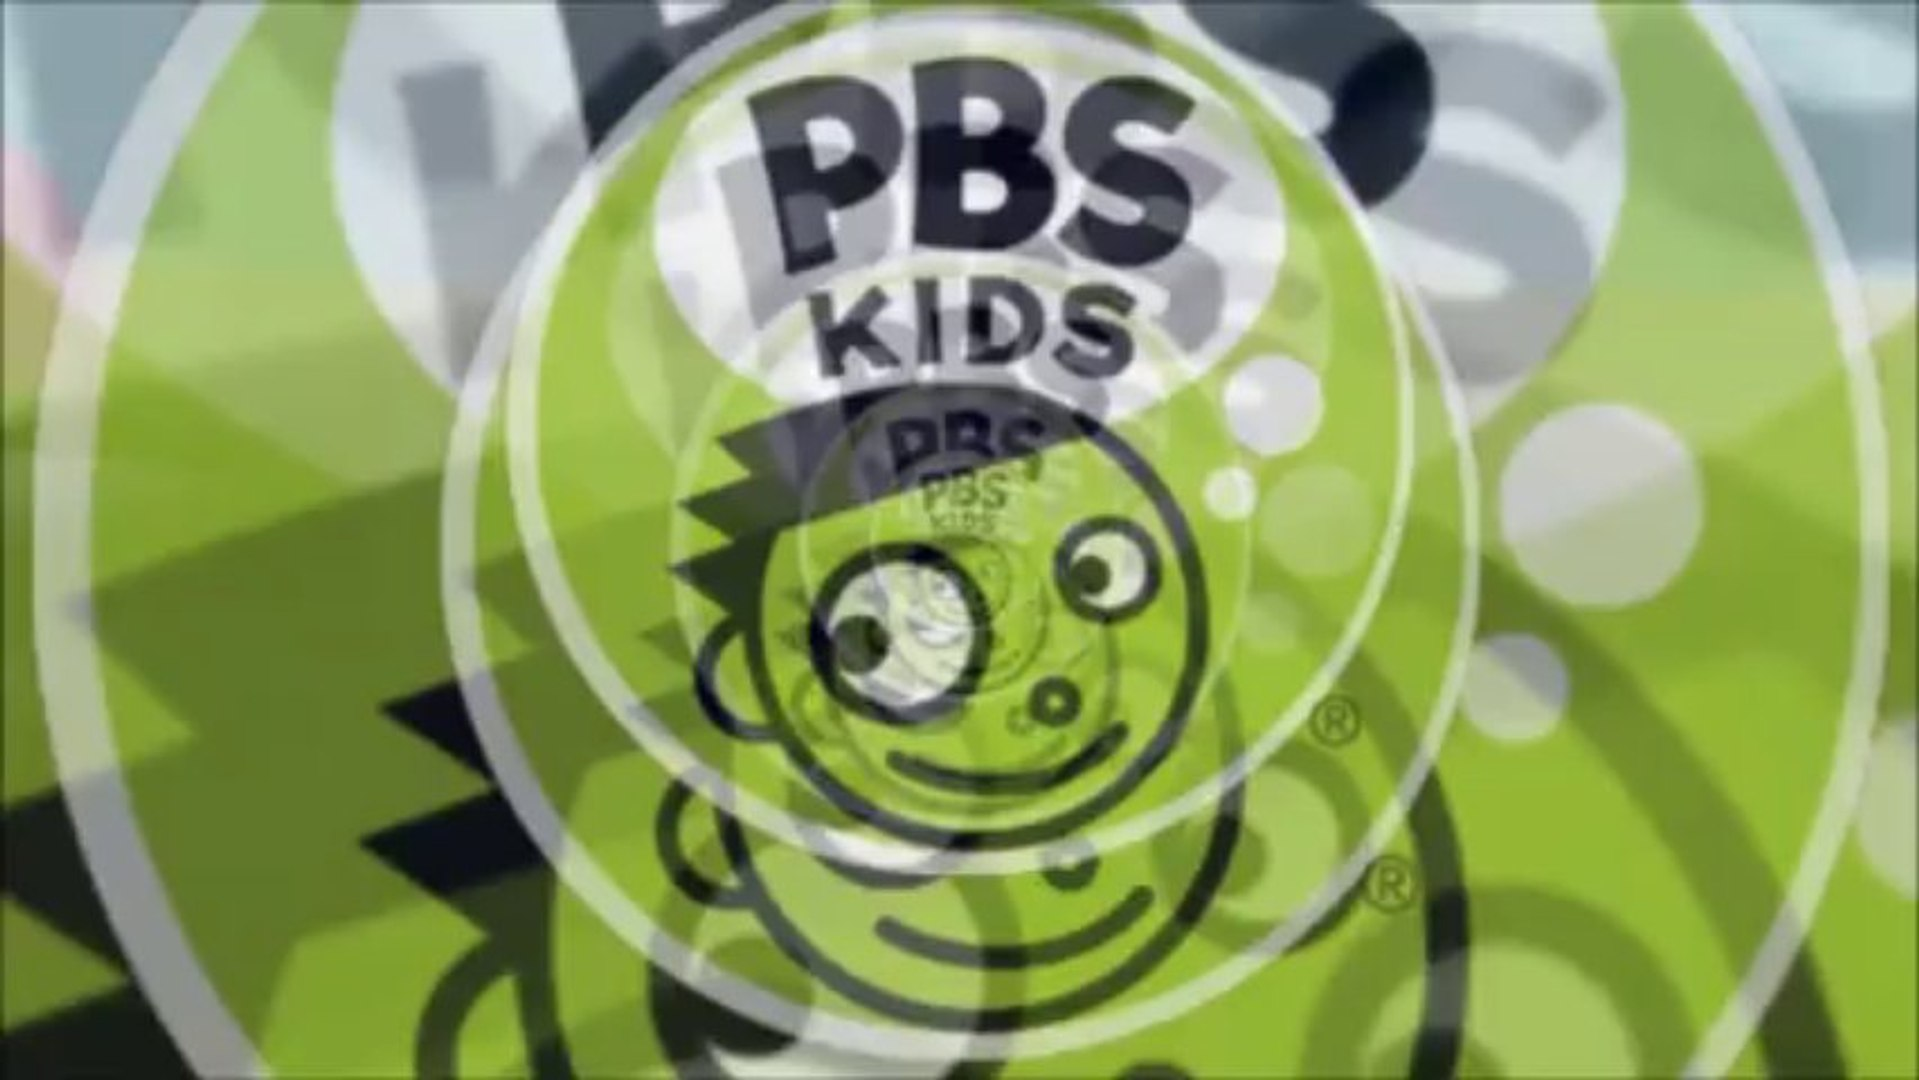 PBS Kids Studios Home Entertainment (2014-Present)